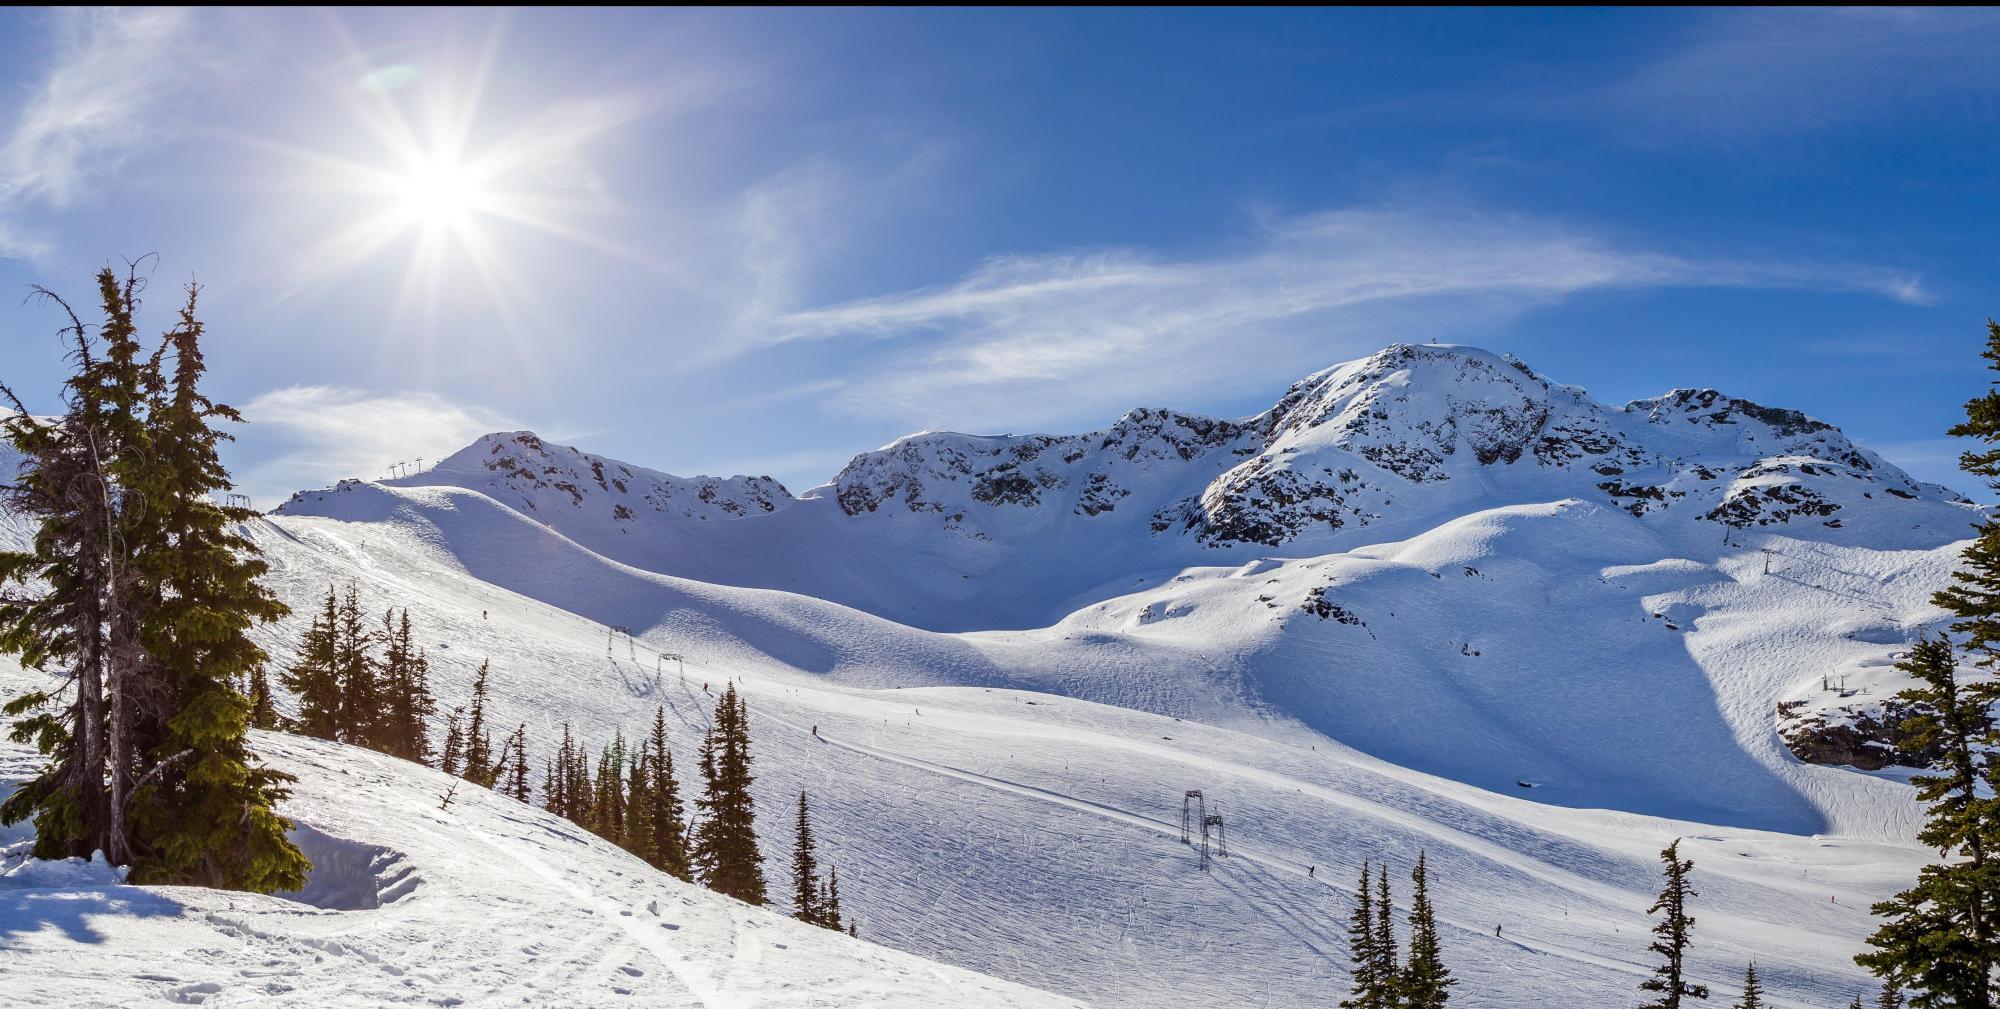 The peak of Whistler Mountain on a sunny day_Adam_Adobe-min